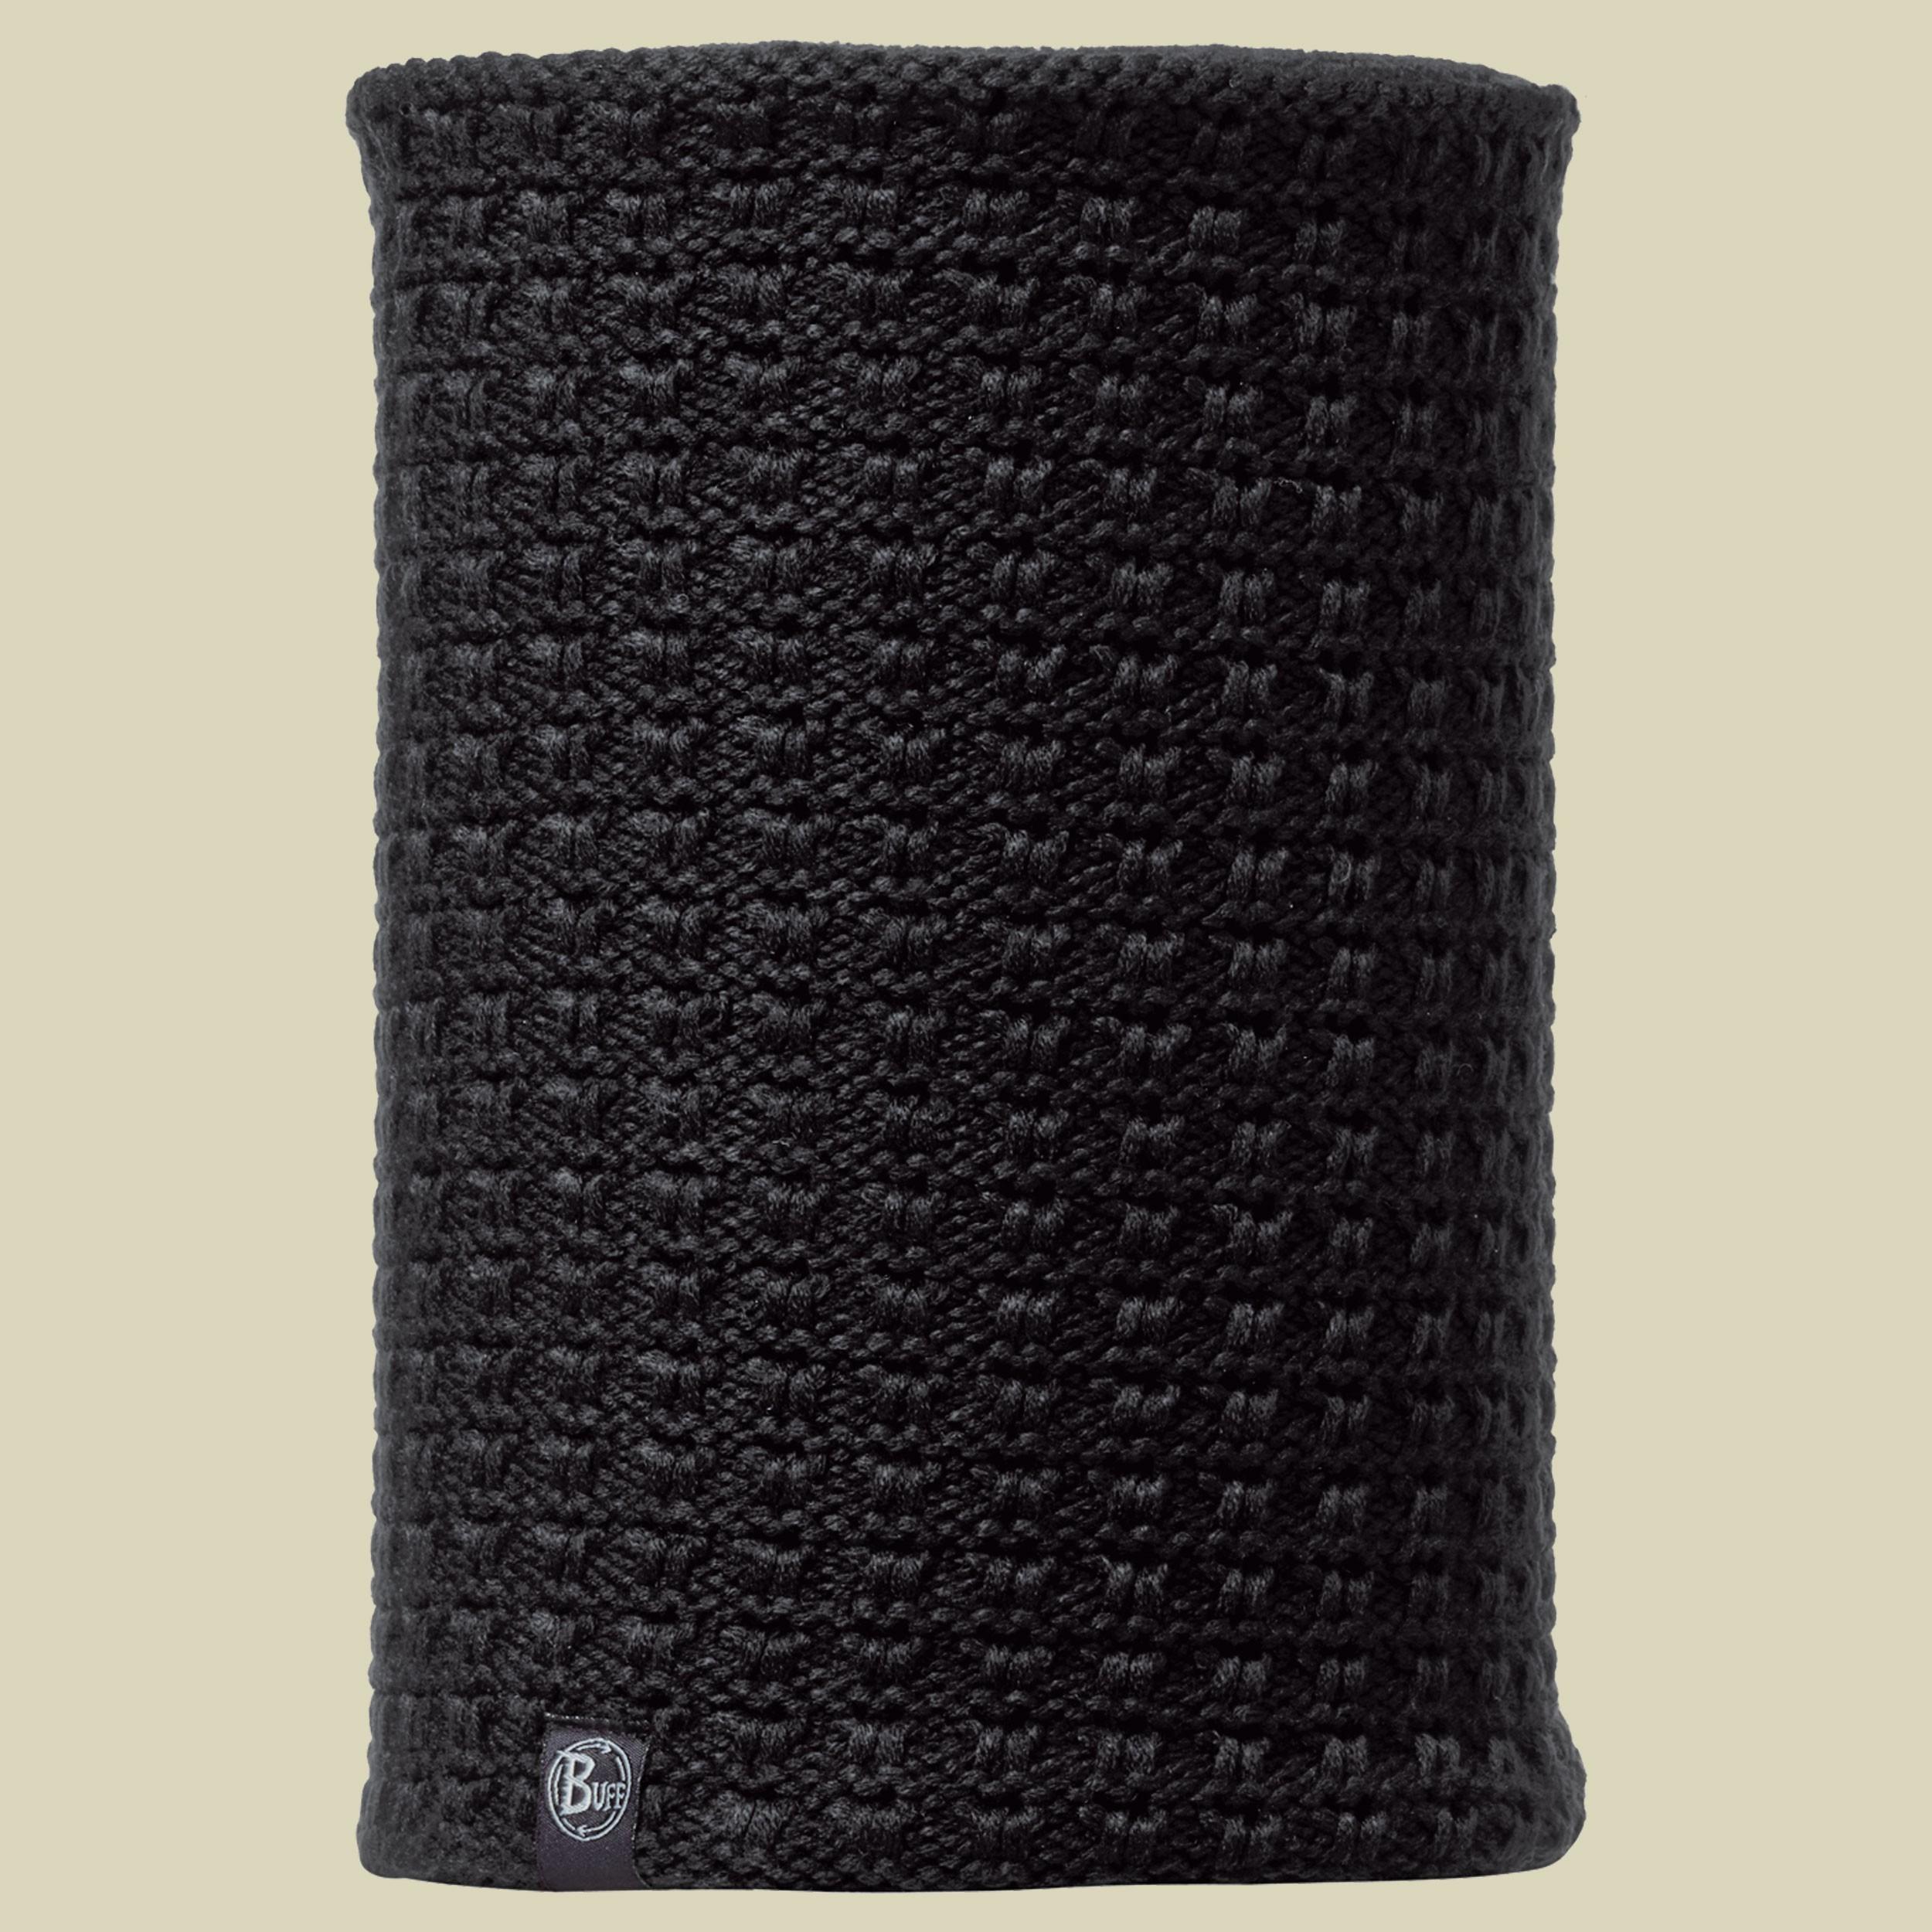 buff_neckwarmer_knitted_344604_ninel_fallback.jpg